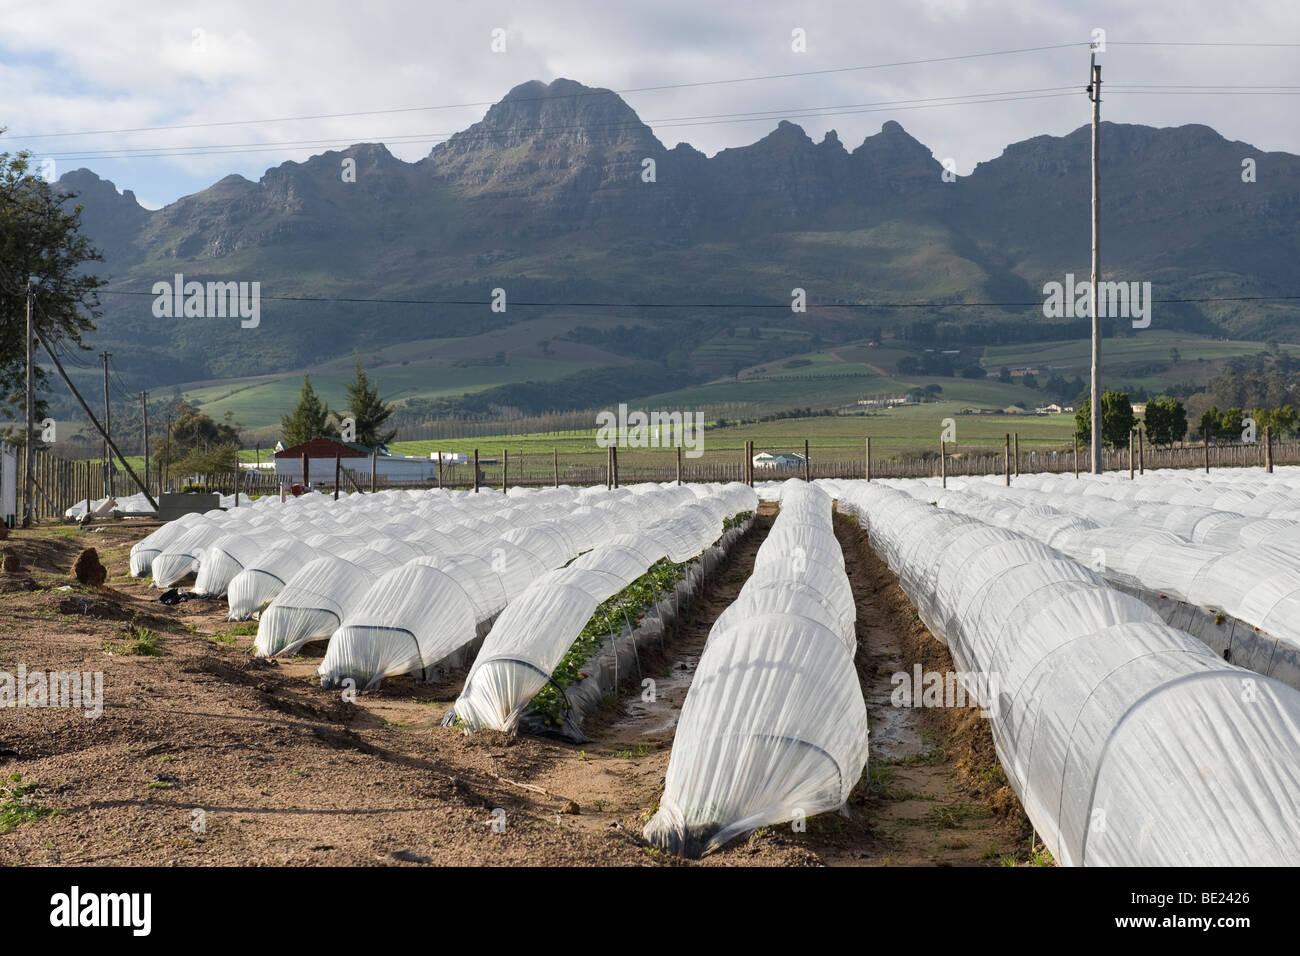 Strawberries Fragaria x ananassa growing under foil tunnels in Stellenbosch South Africa - Stock Image